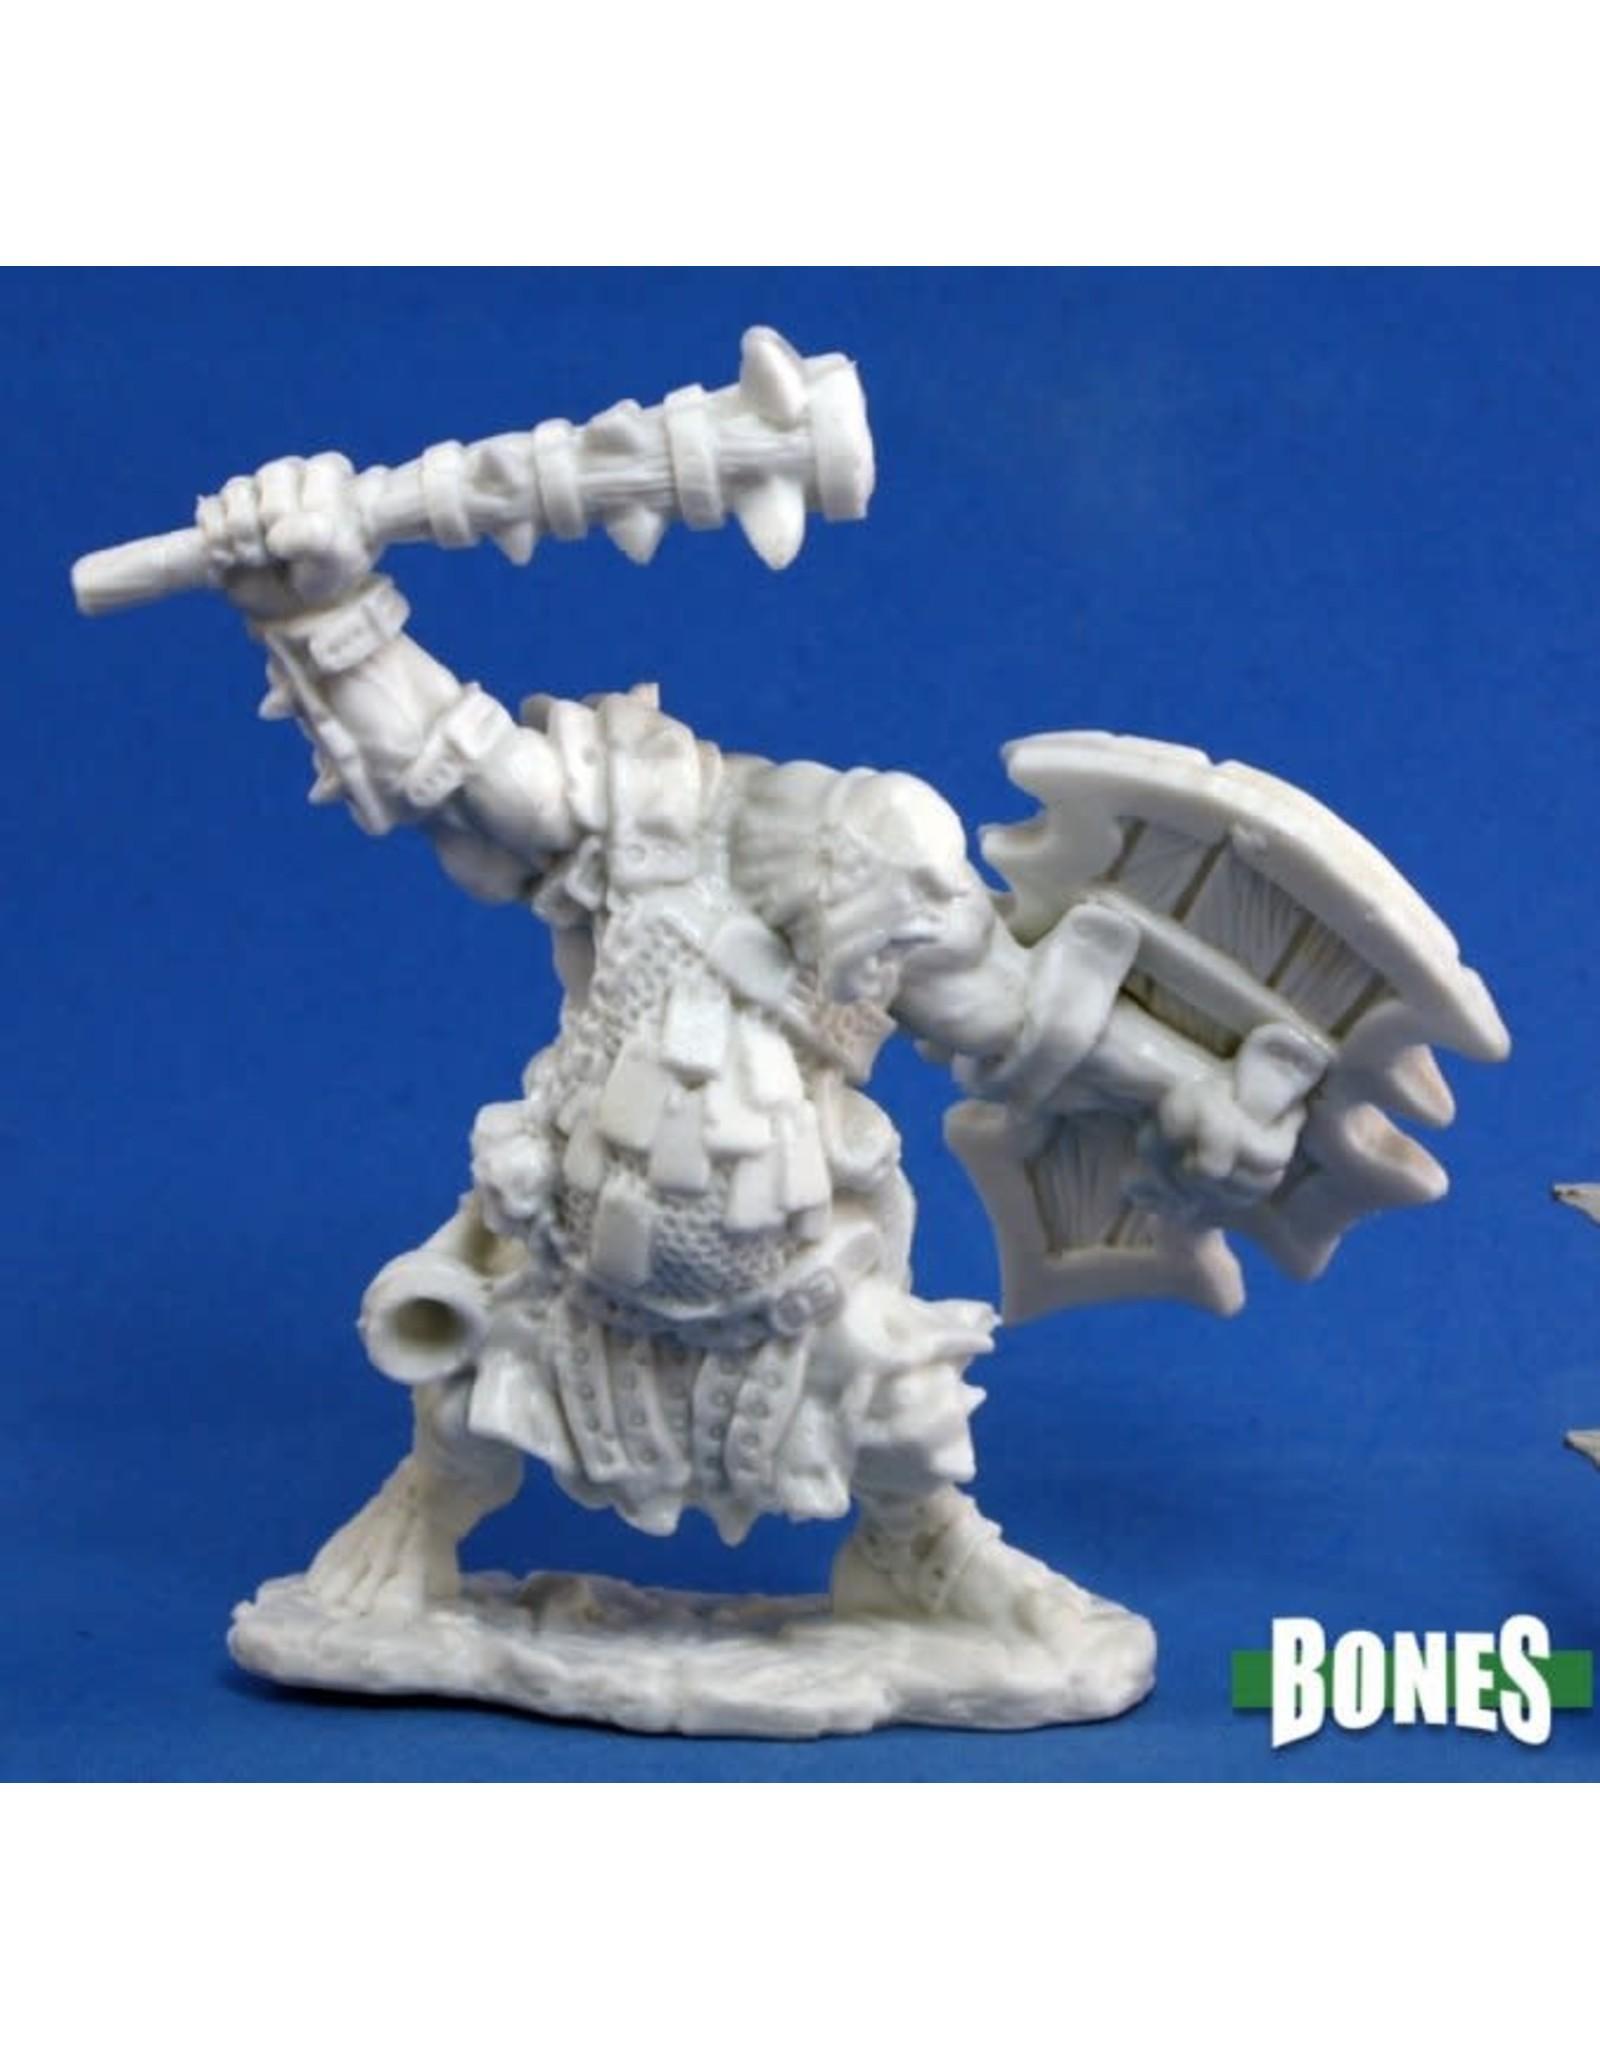 Reaper Dark Heaven Bones: Kagunk Ogre Chieftain